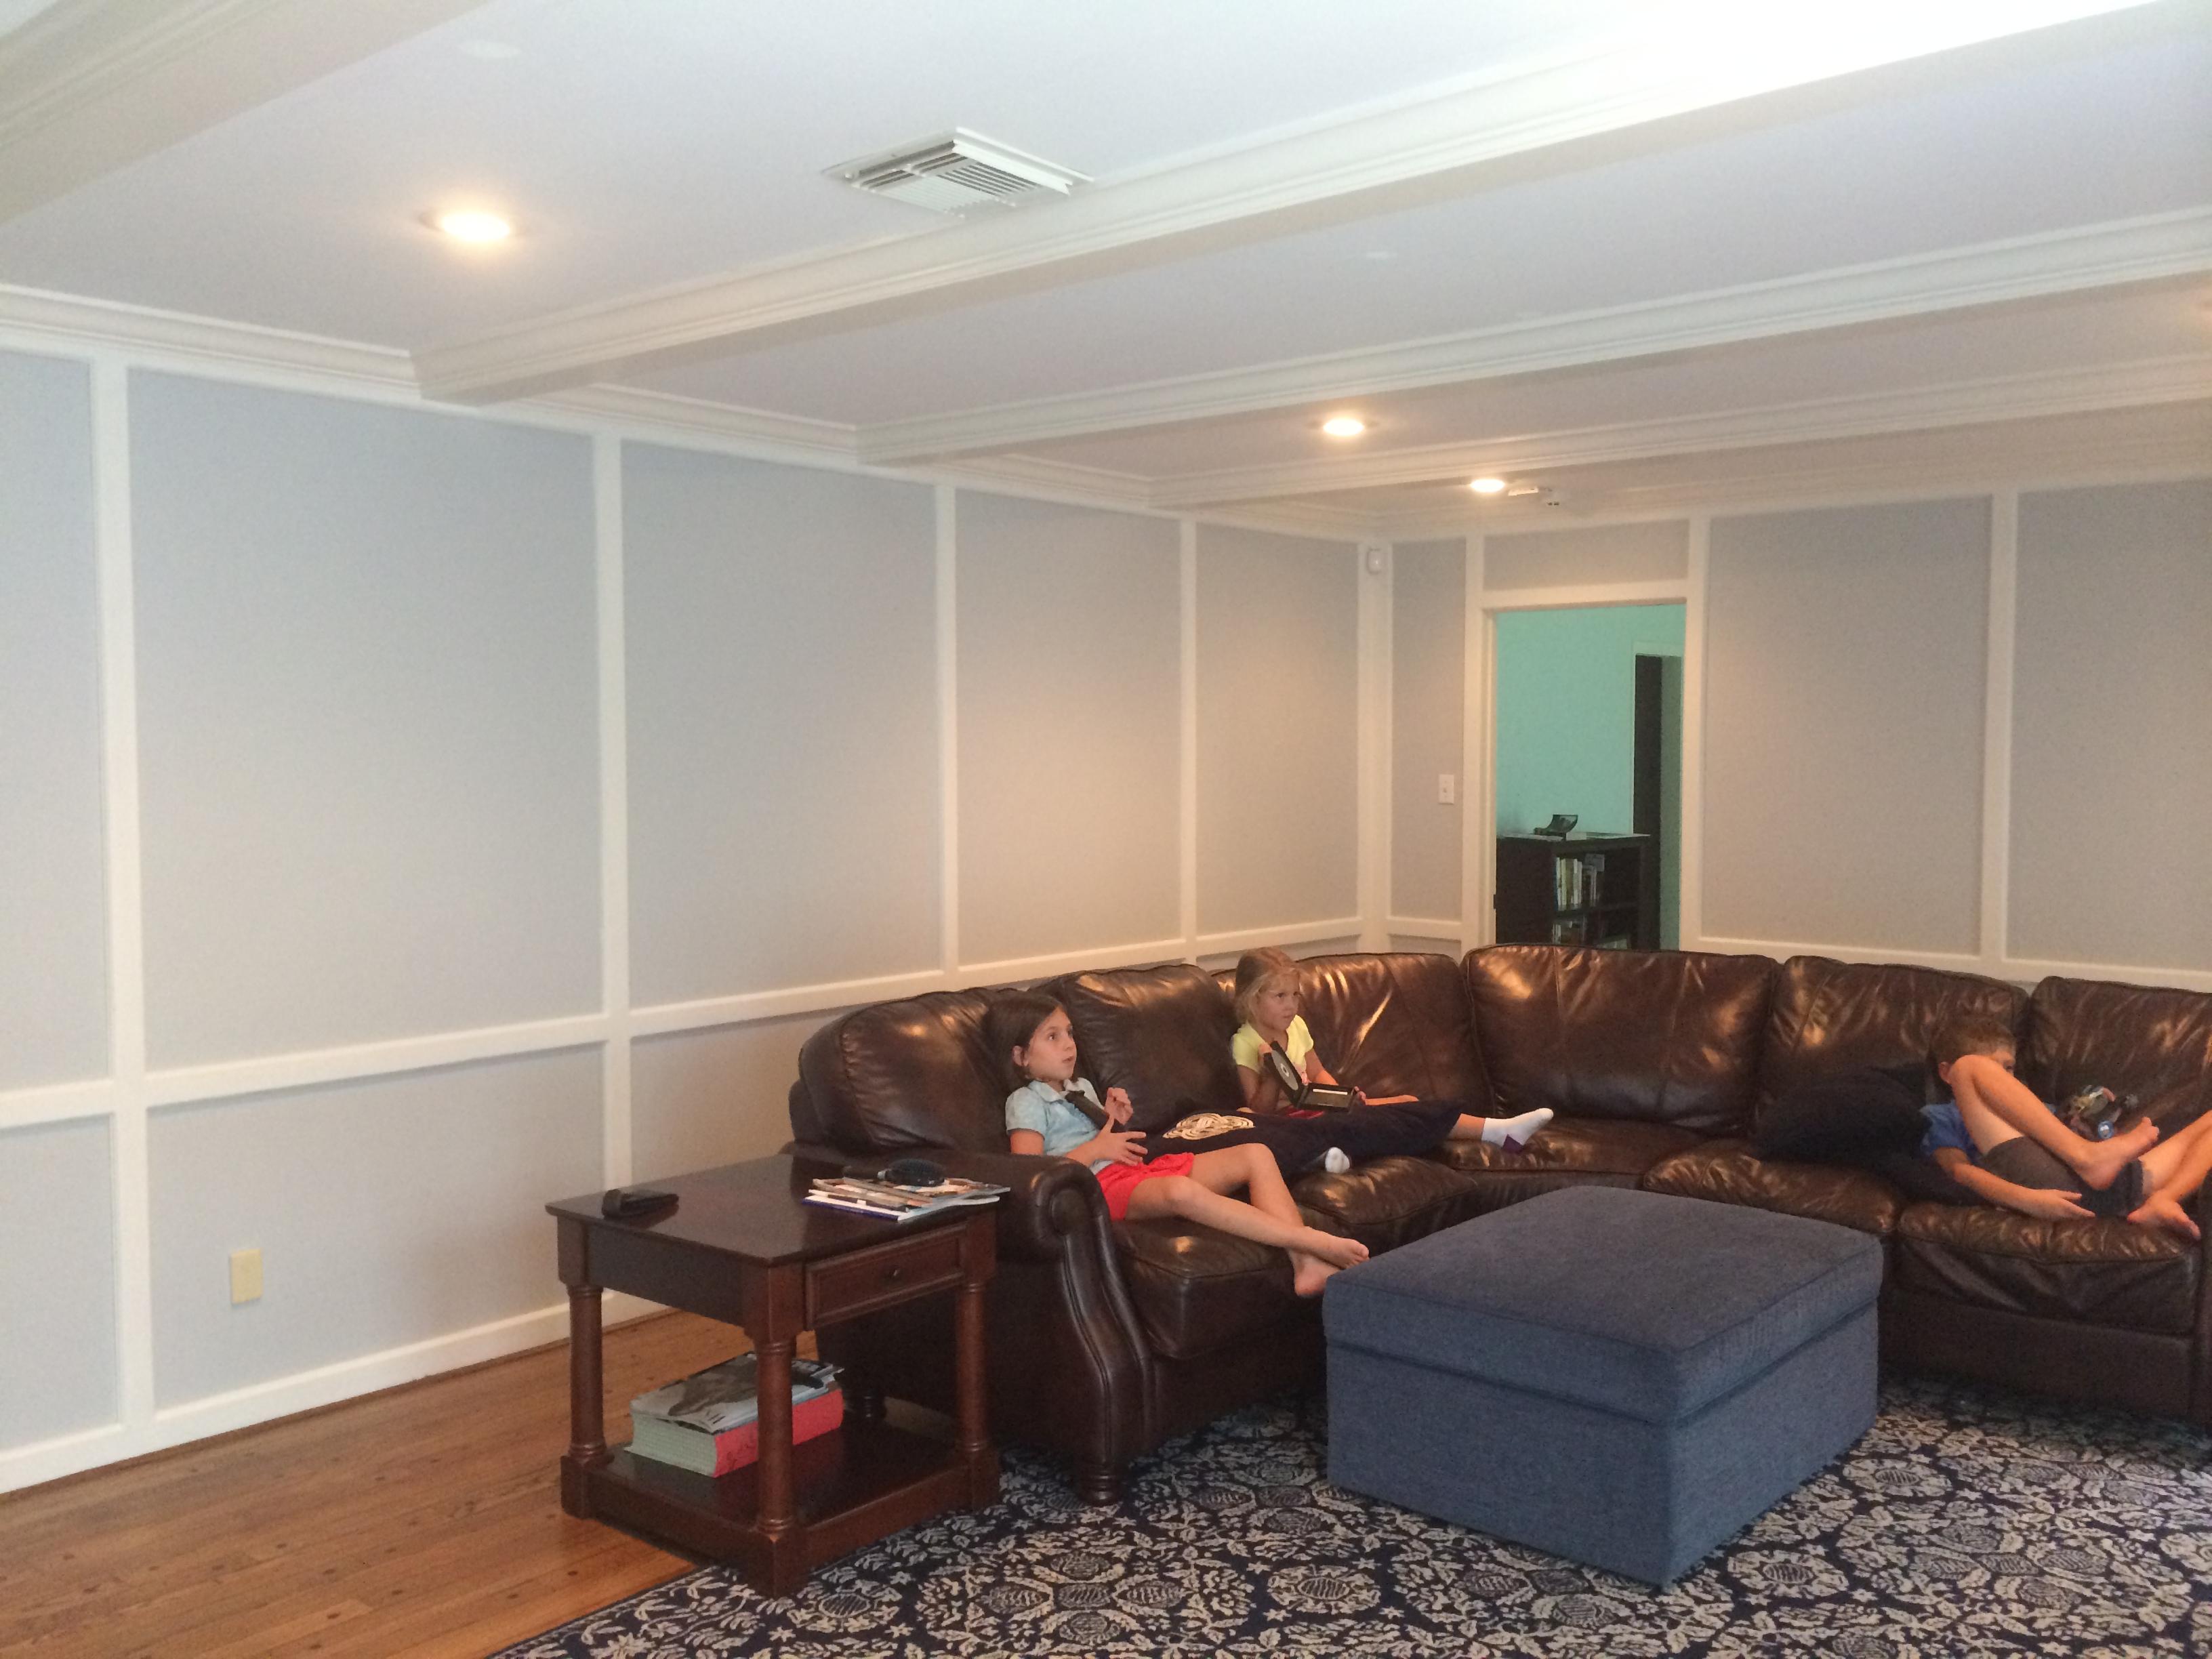 Living Room Help Design My Living Room help me design my living room cassco co img jpg room